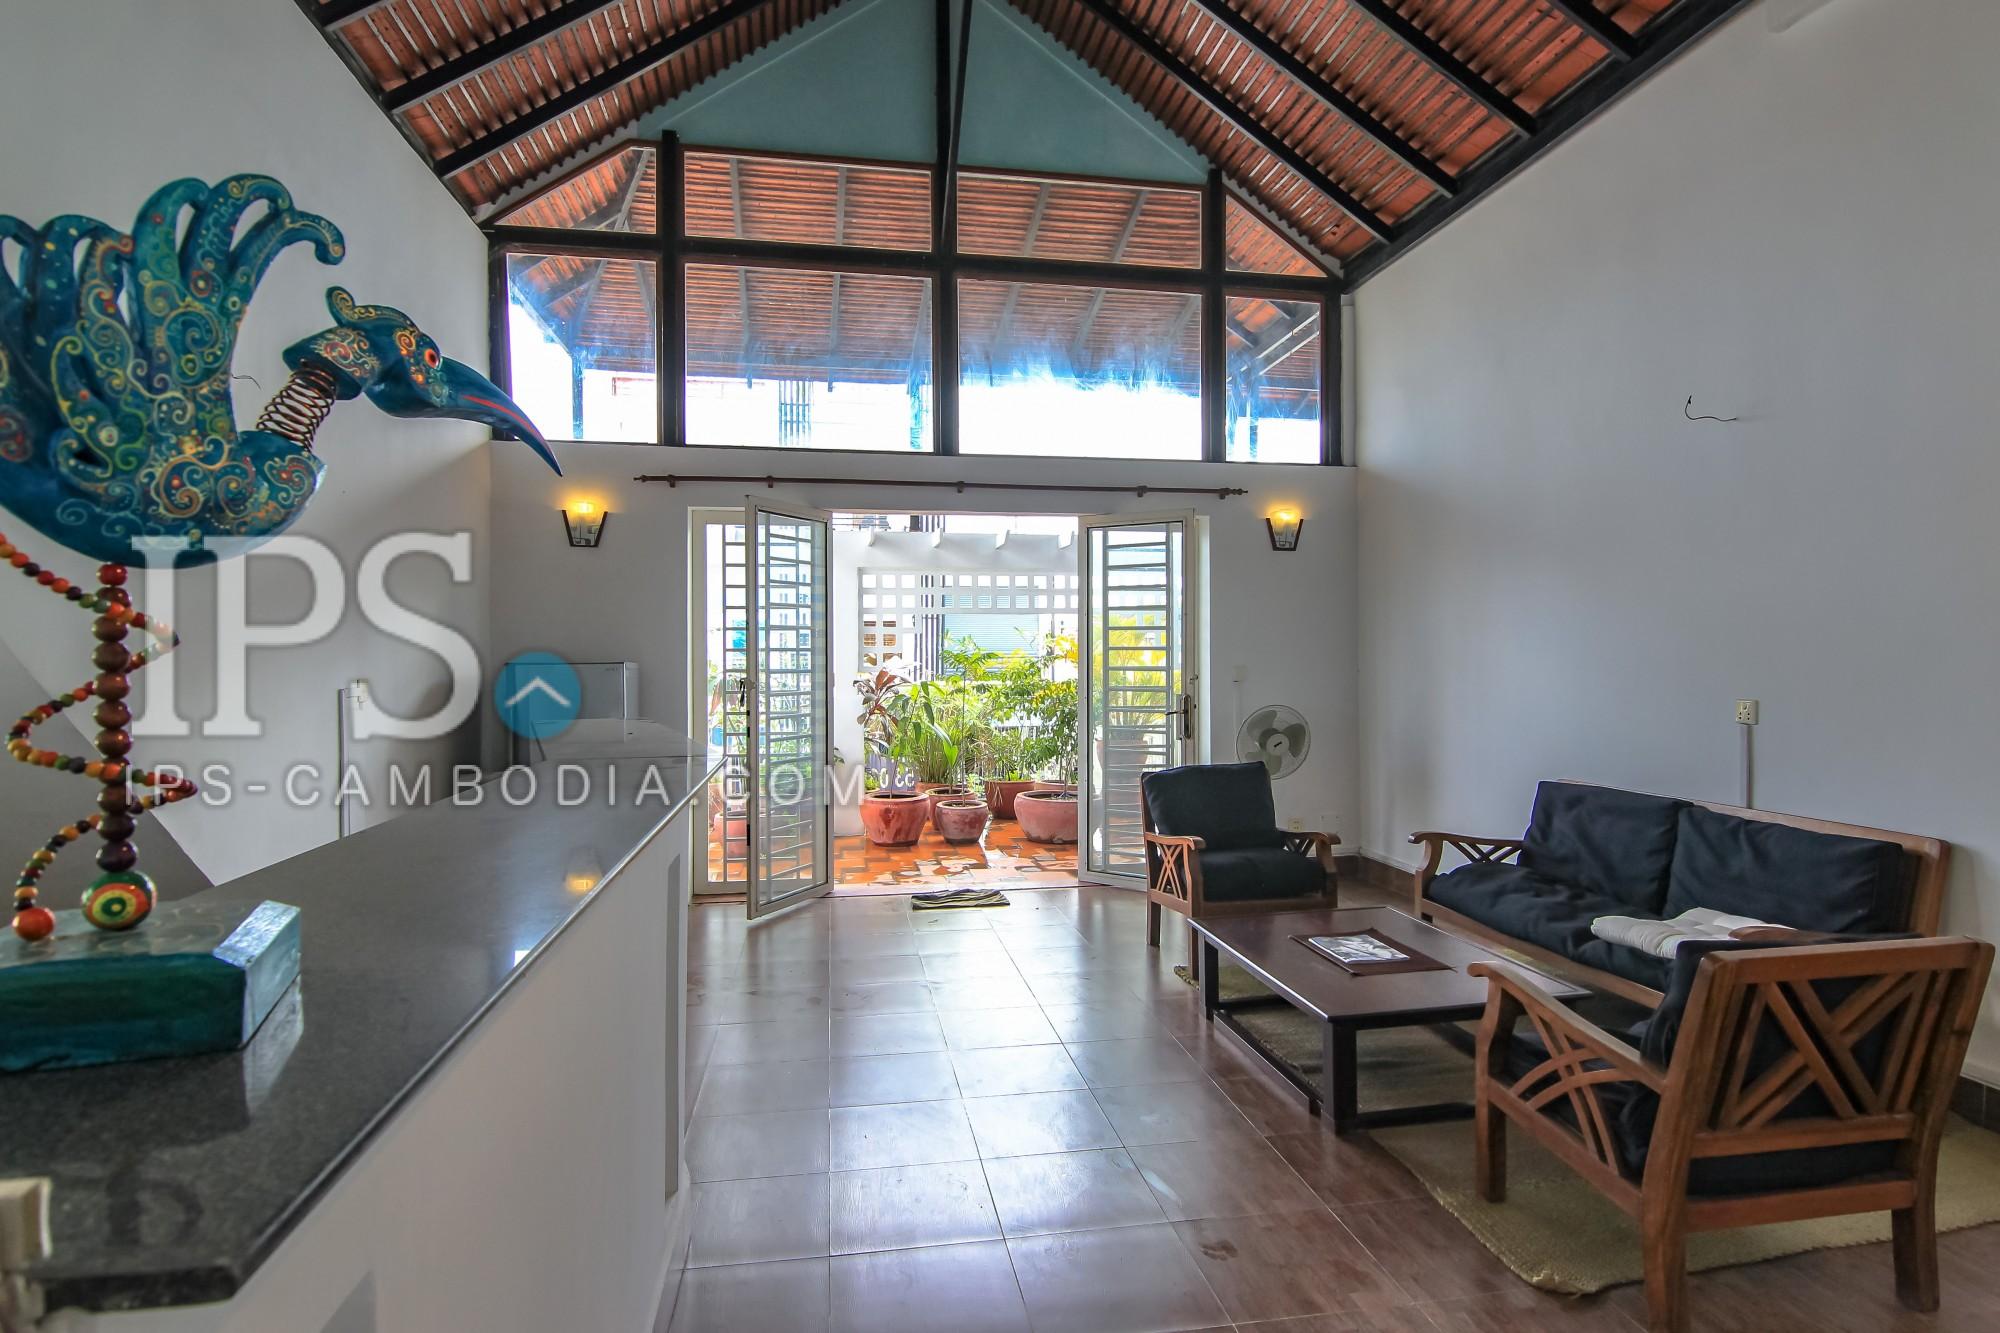 2 Bedrooms Plus Rooftop Terrace Flat For Sale - Wat Phnom,Phnom Penh